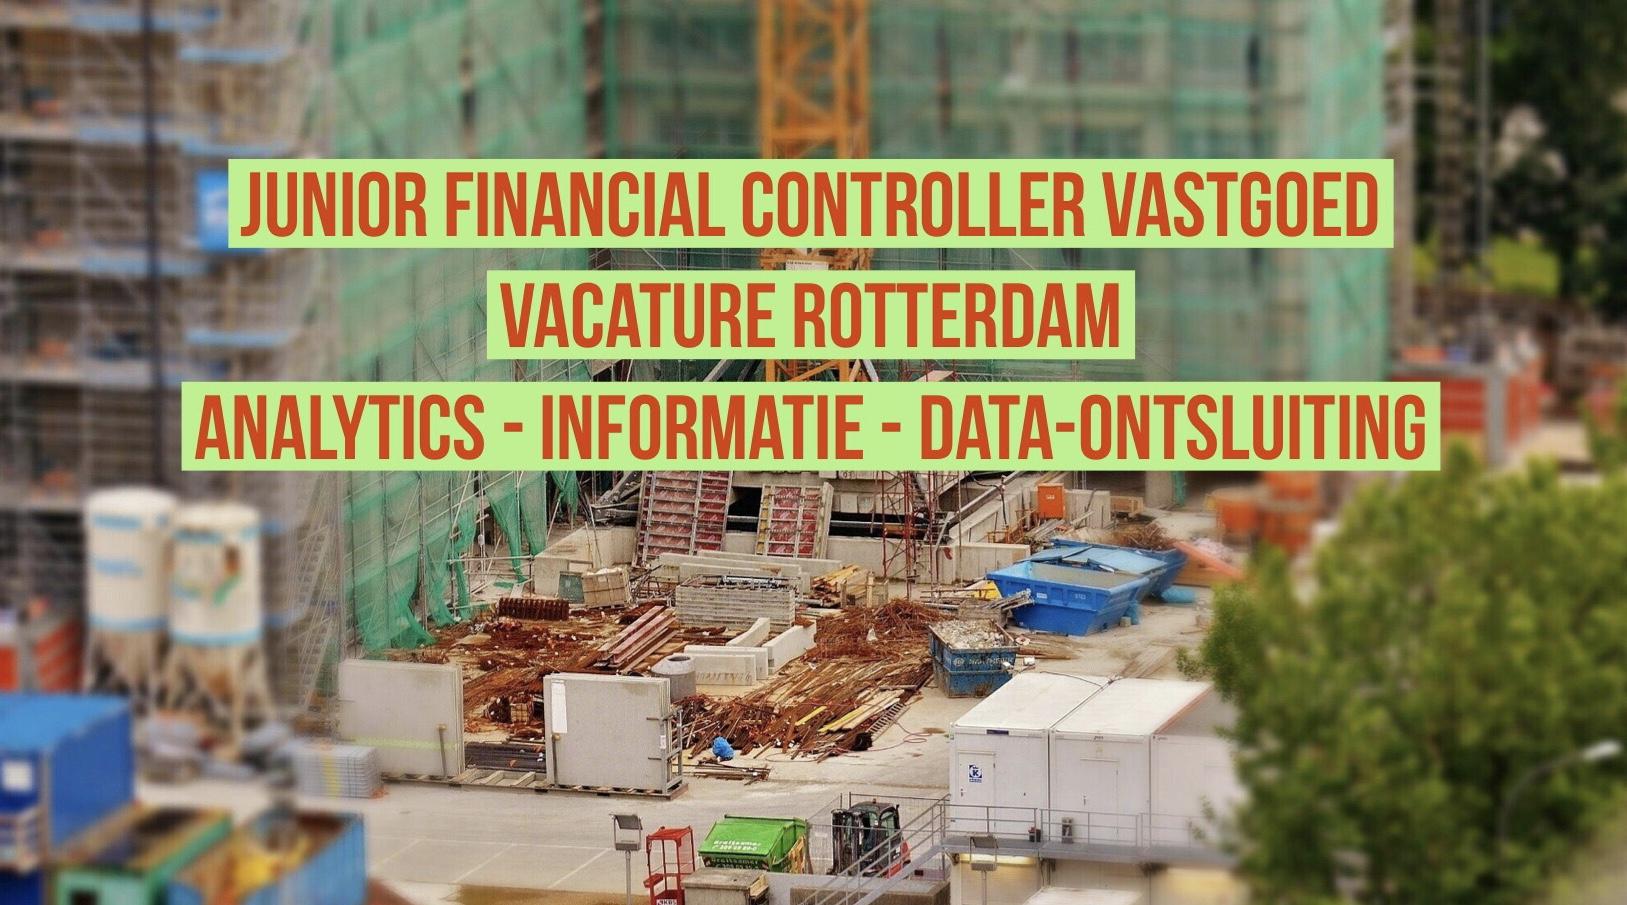 Junior Financial Controller Vastgoed vacature Rotterdam woningbouw